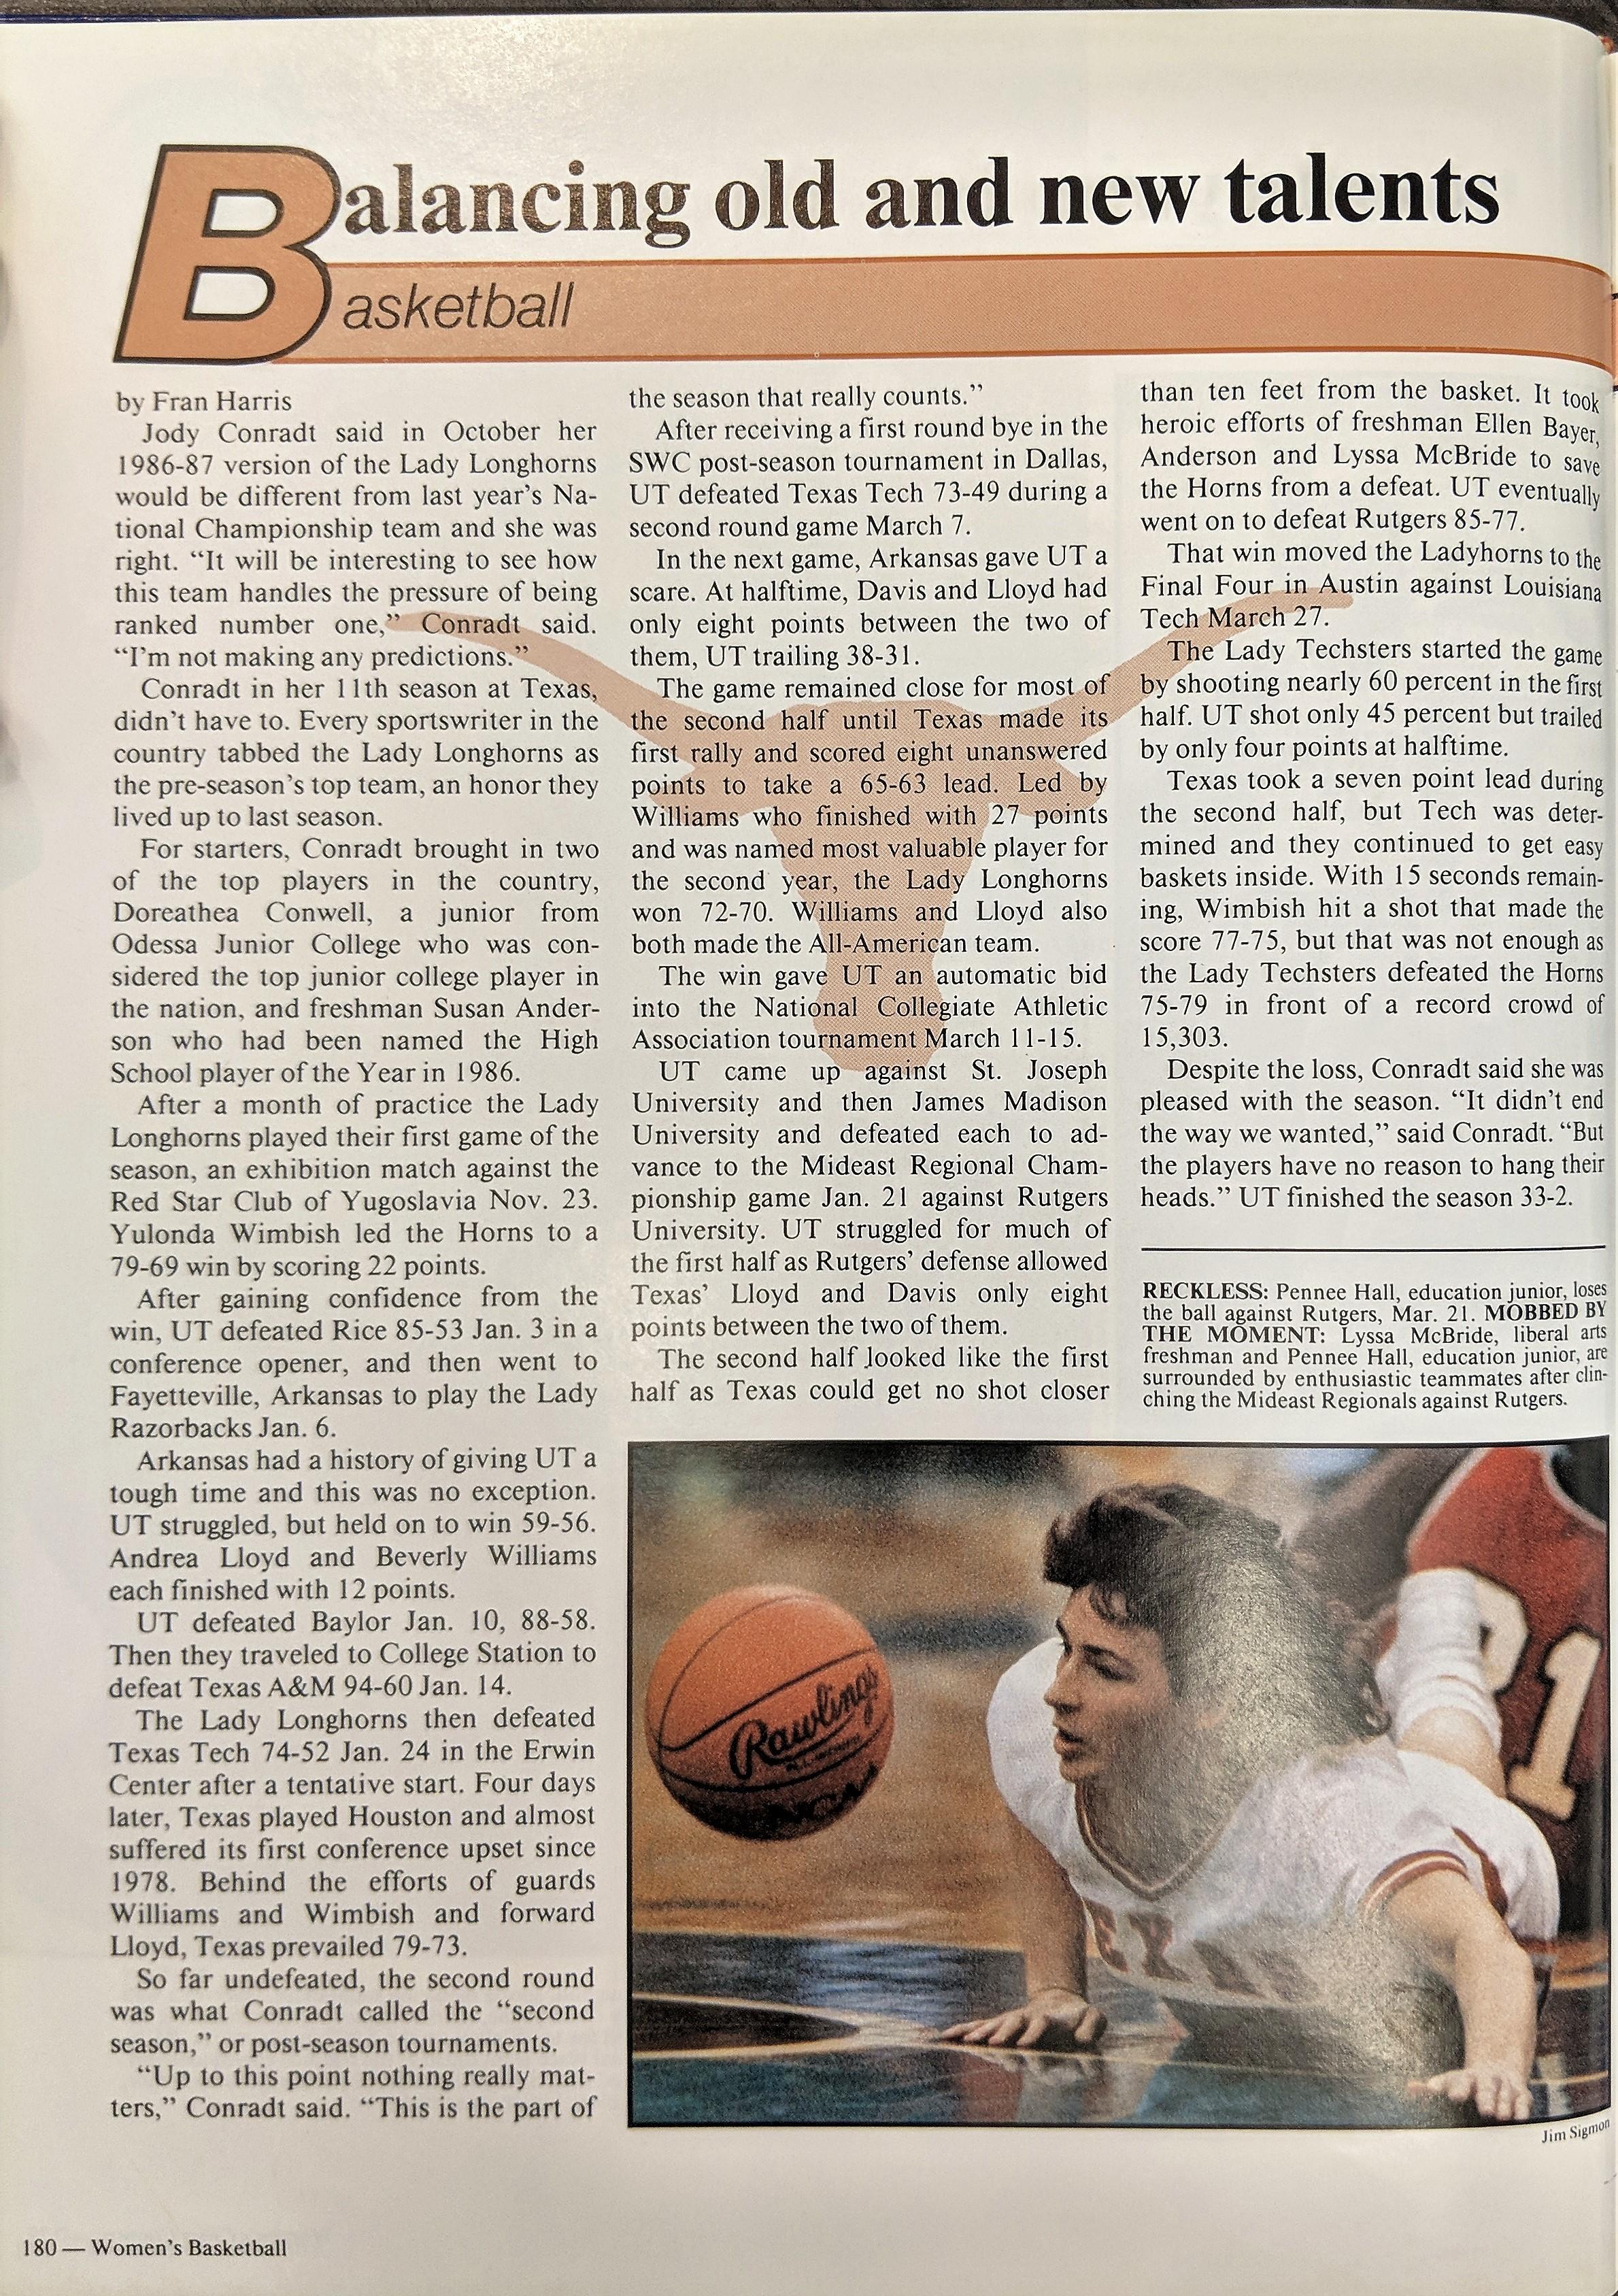 1987 basketball  Fran Harris.jpg